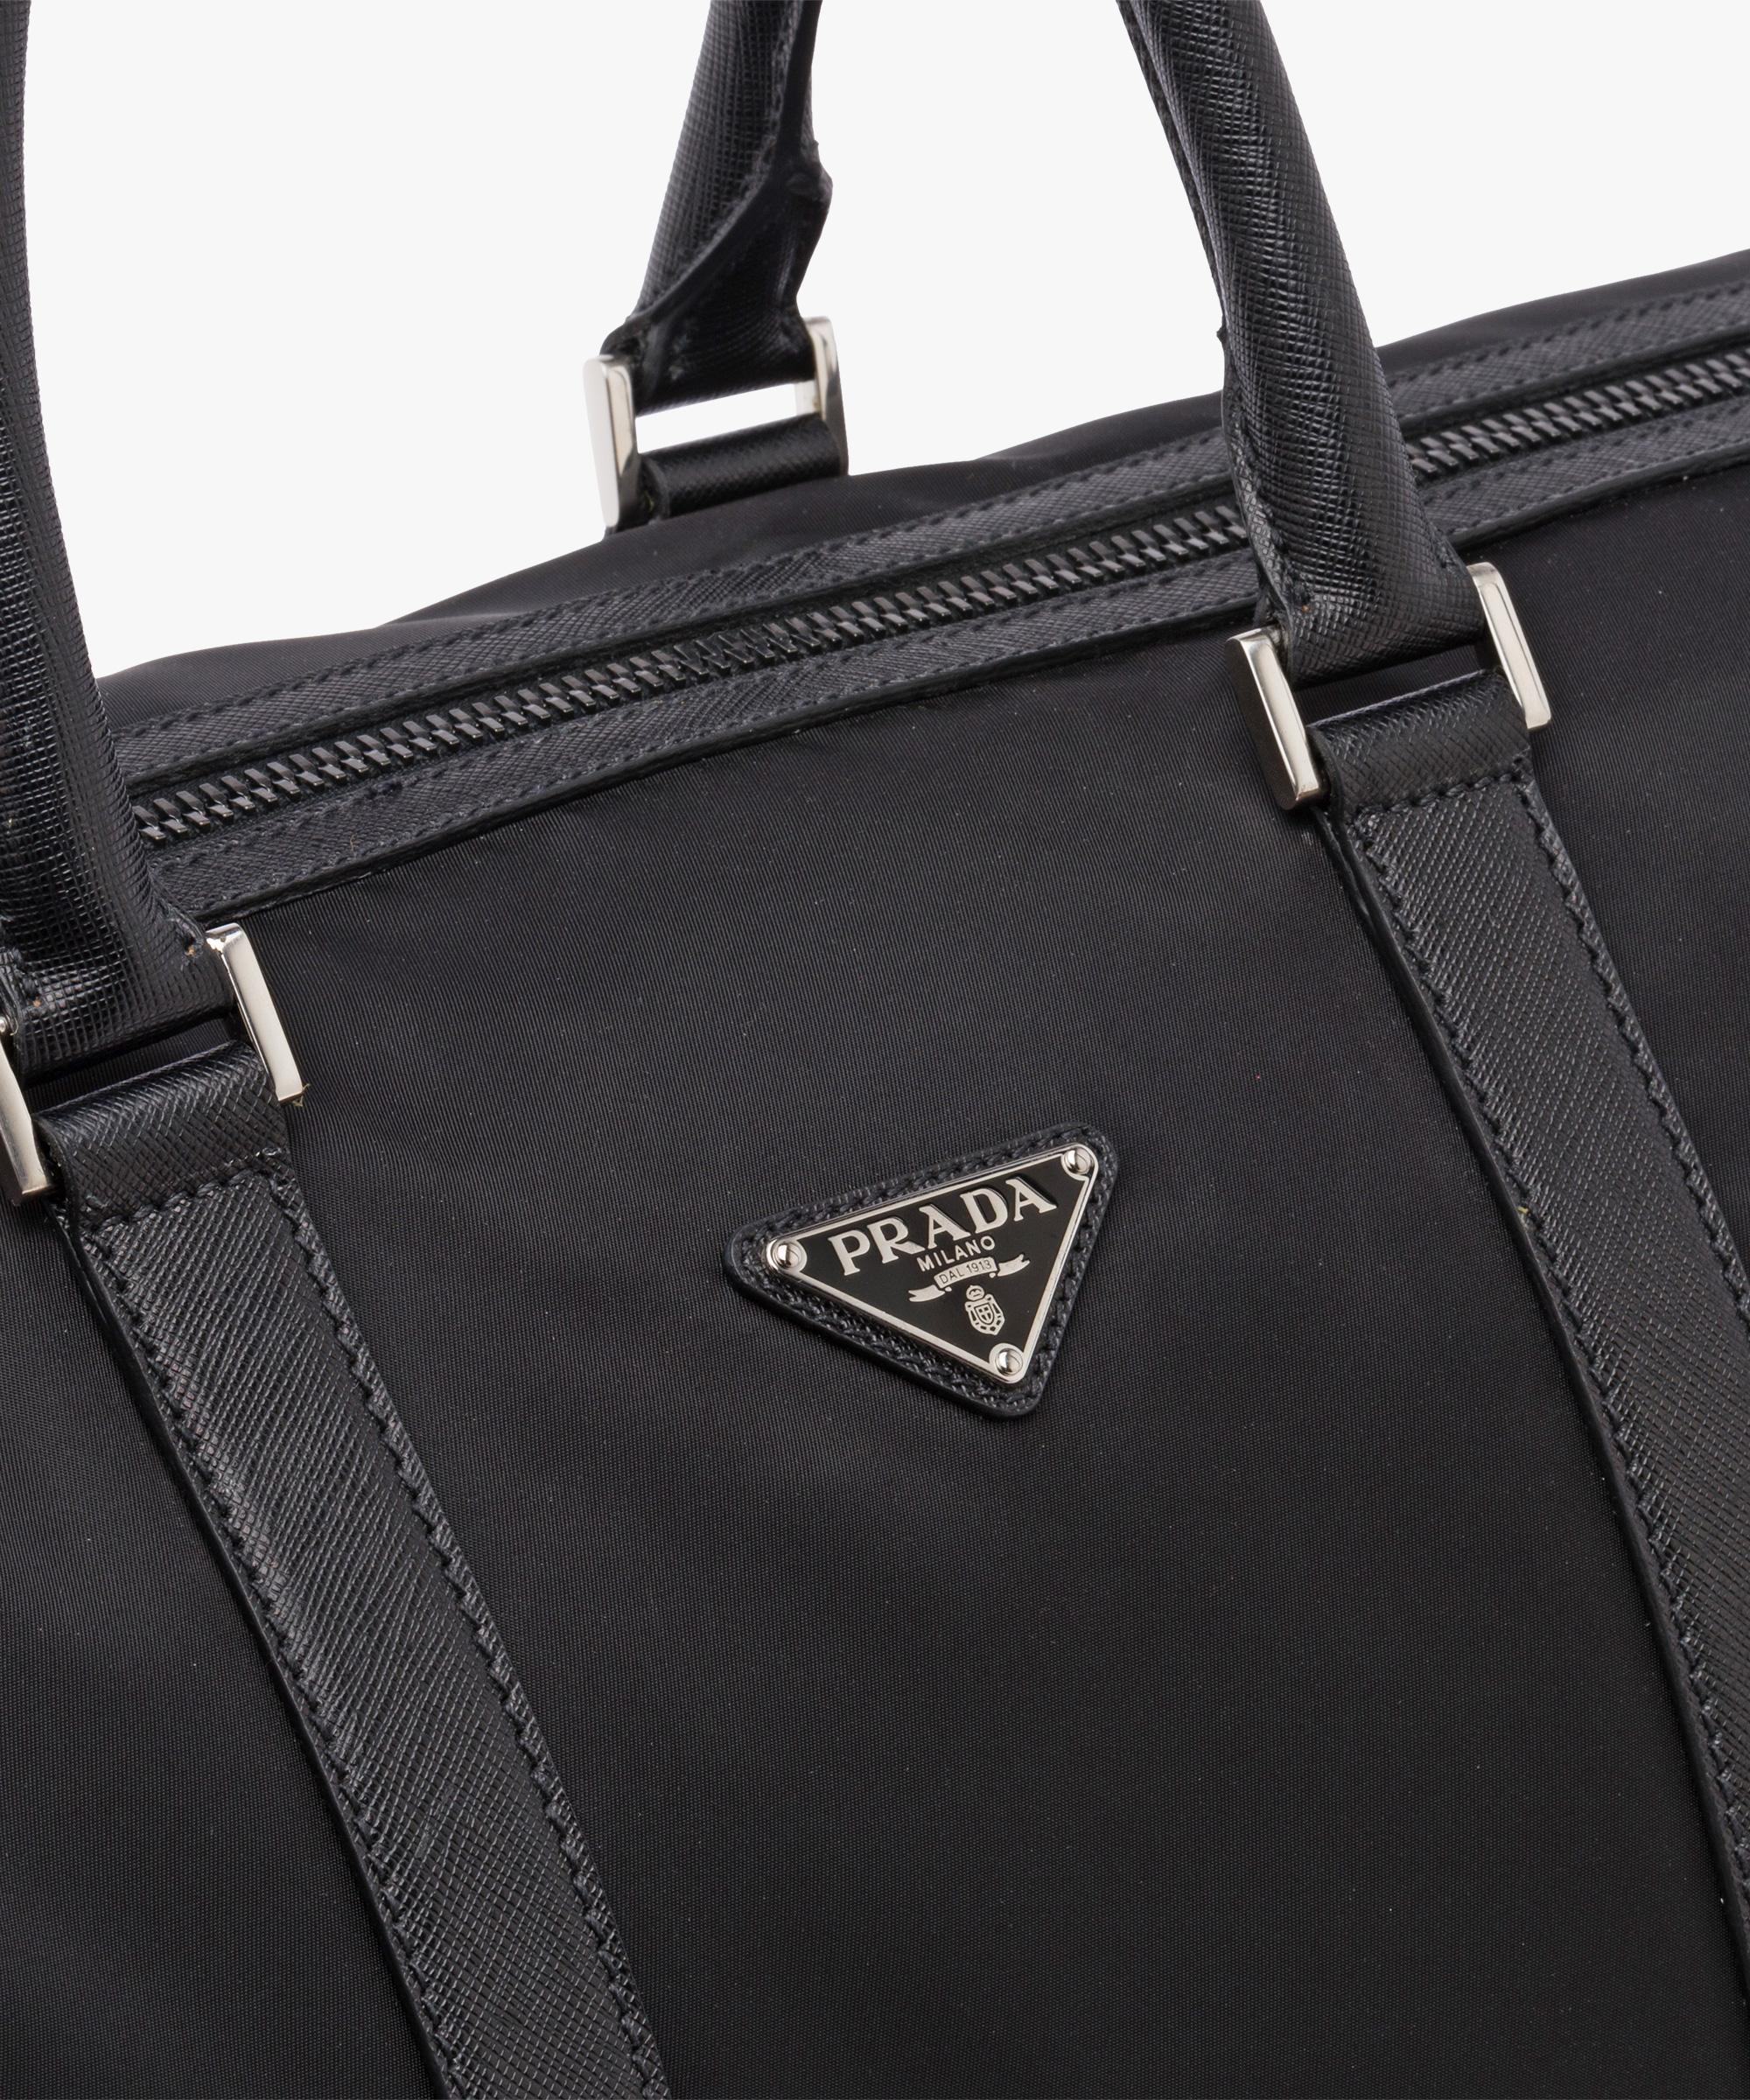 27f72baedded0 ... Nylon And Saffiano Leather Travel Bag Prada BLACK ...